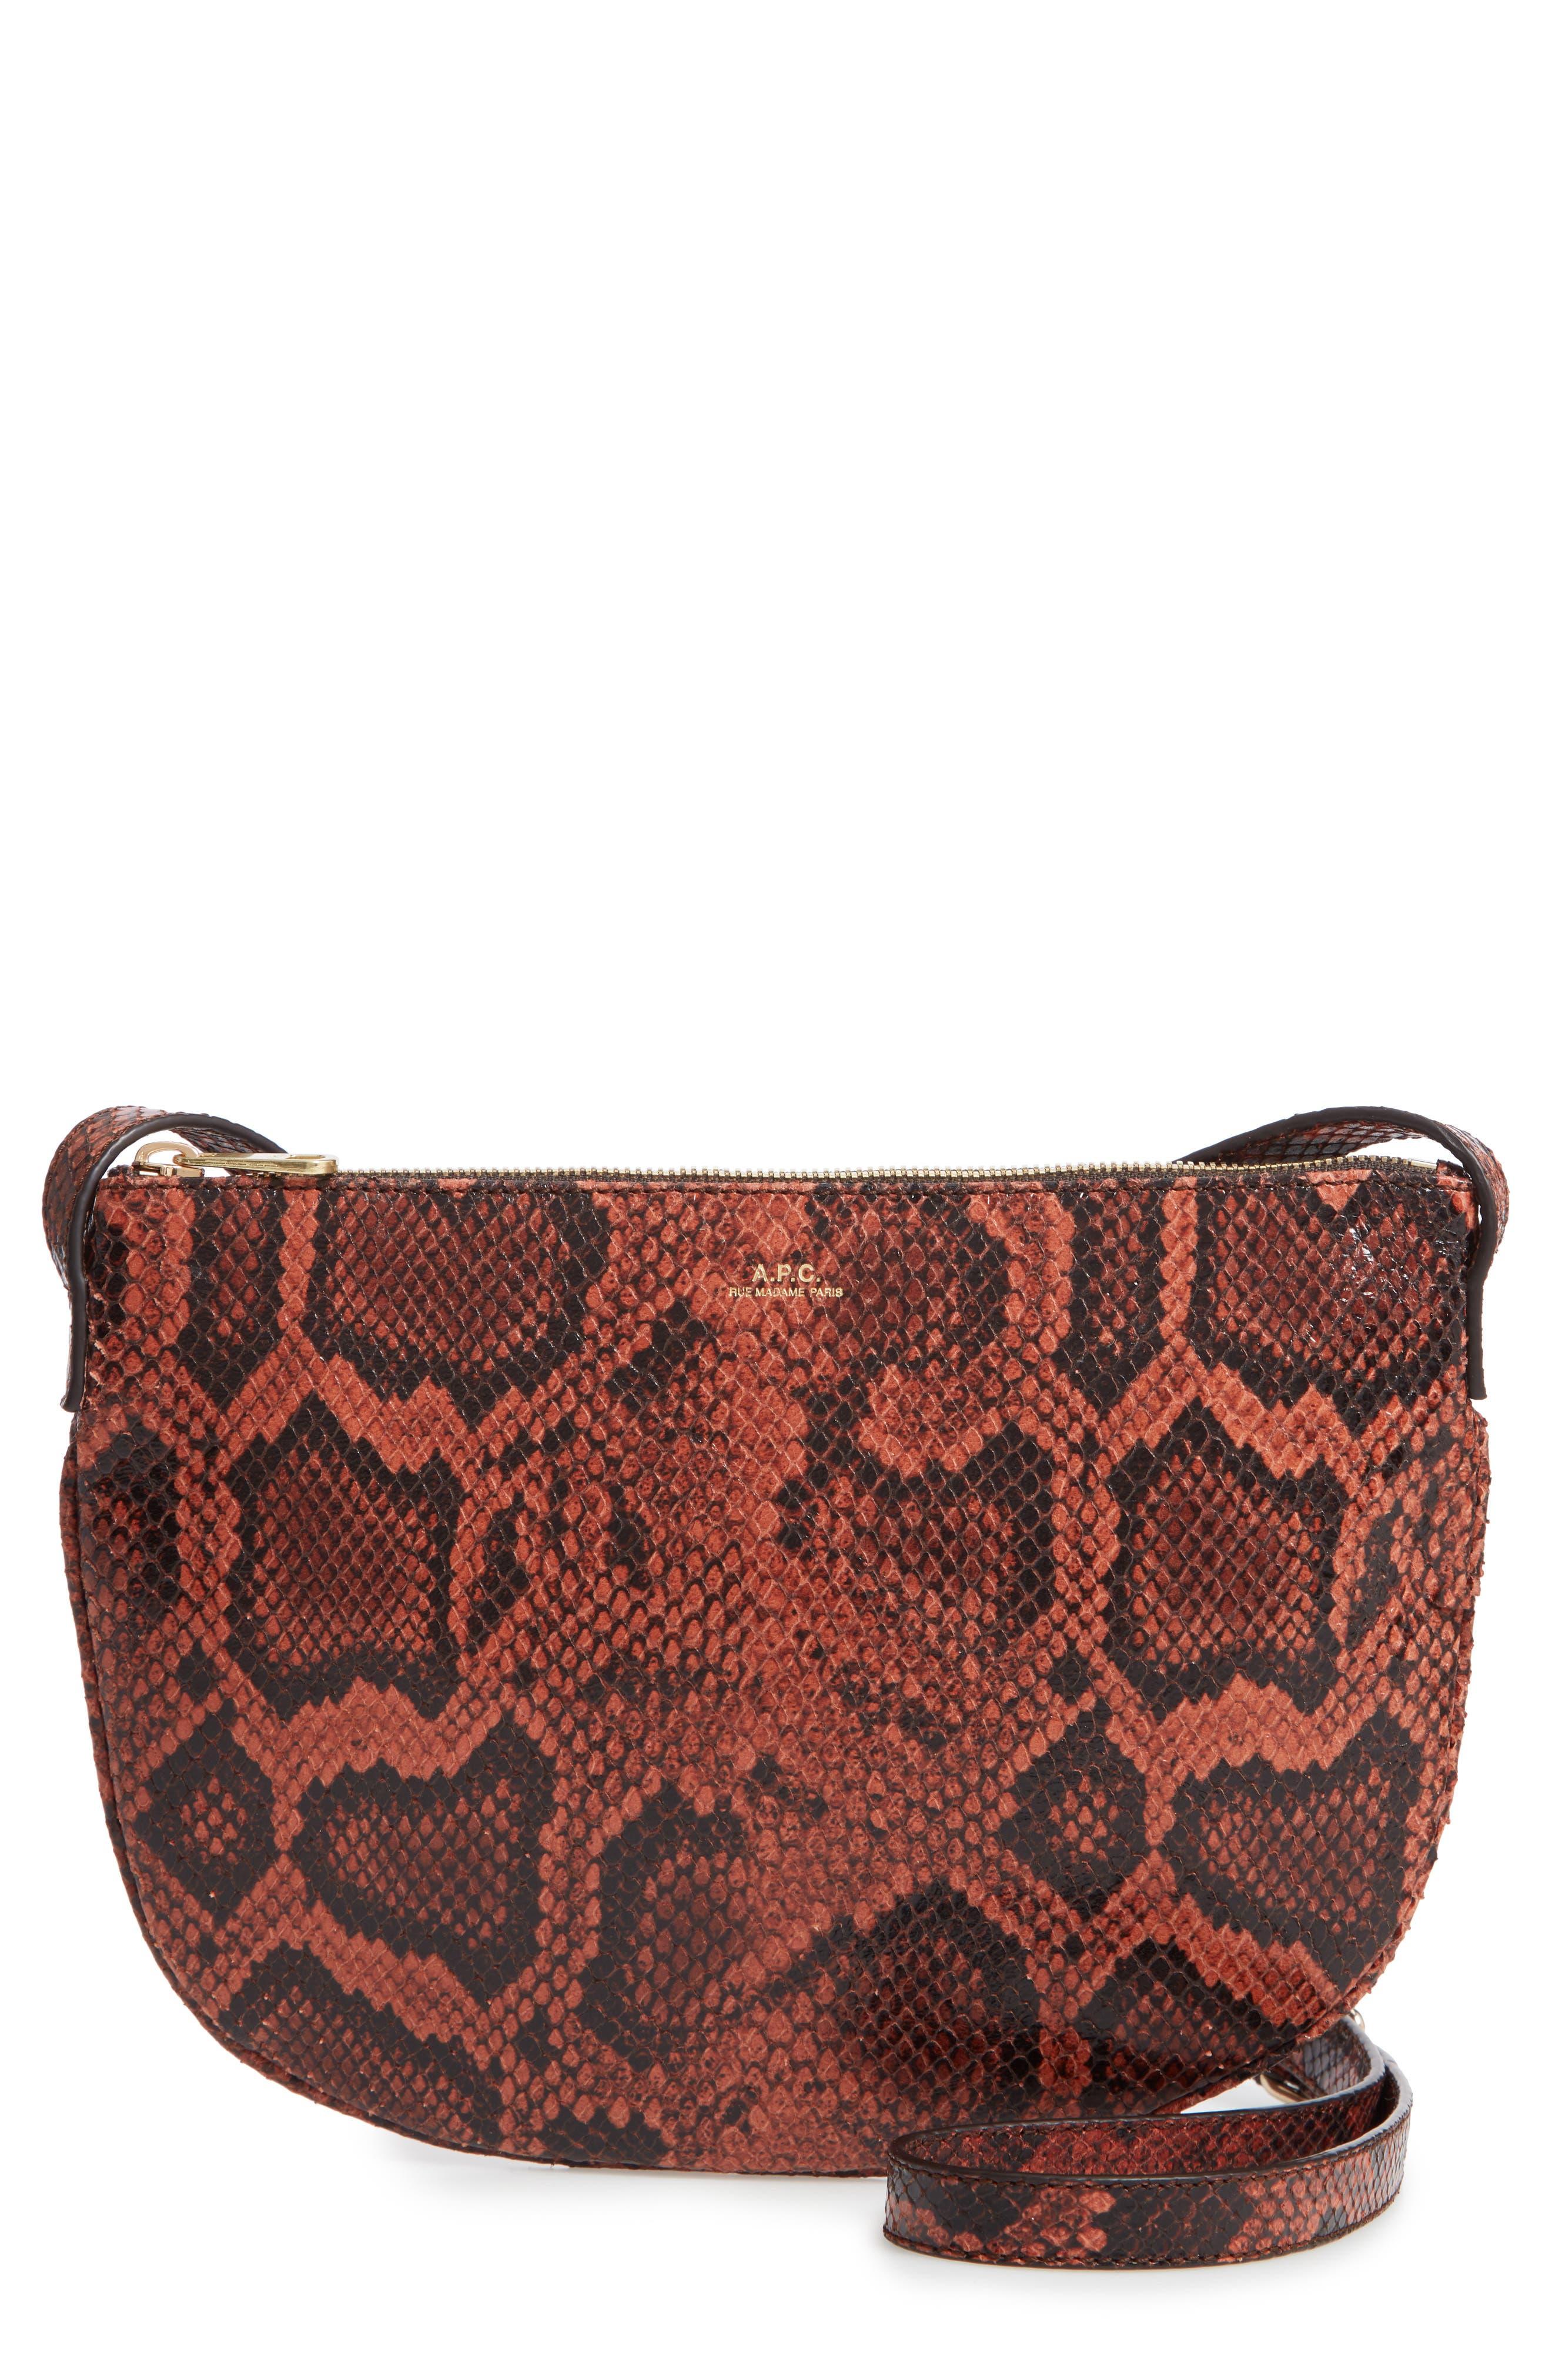 A.P.C., Sac Maelys Python Embossed Leather Crossbody Bag, Main thumbnail 1, color, EAF BRIQUE